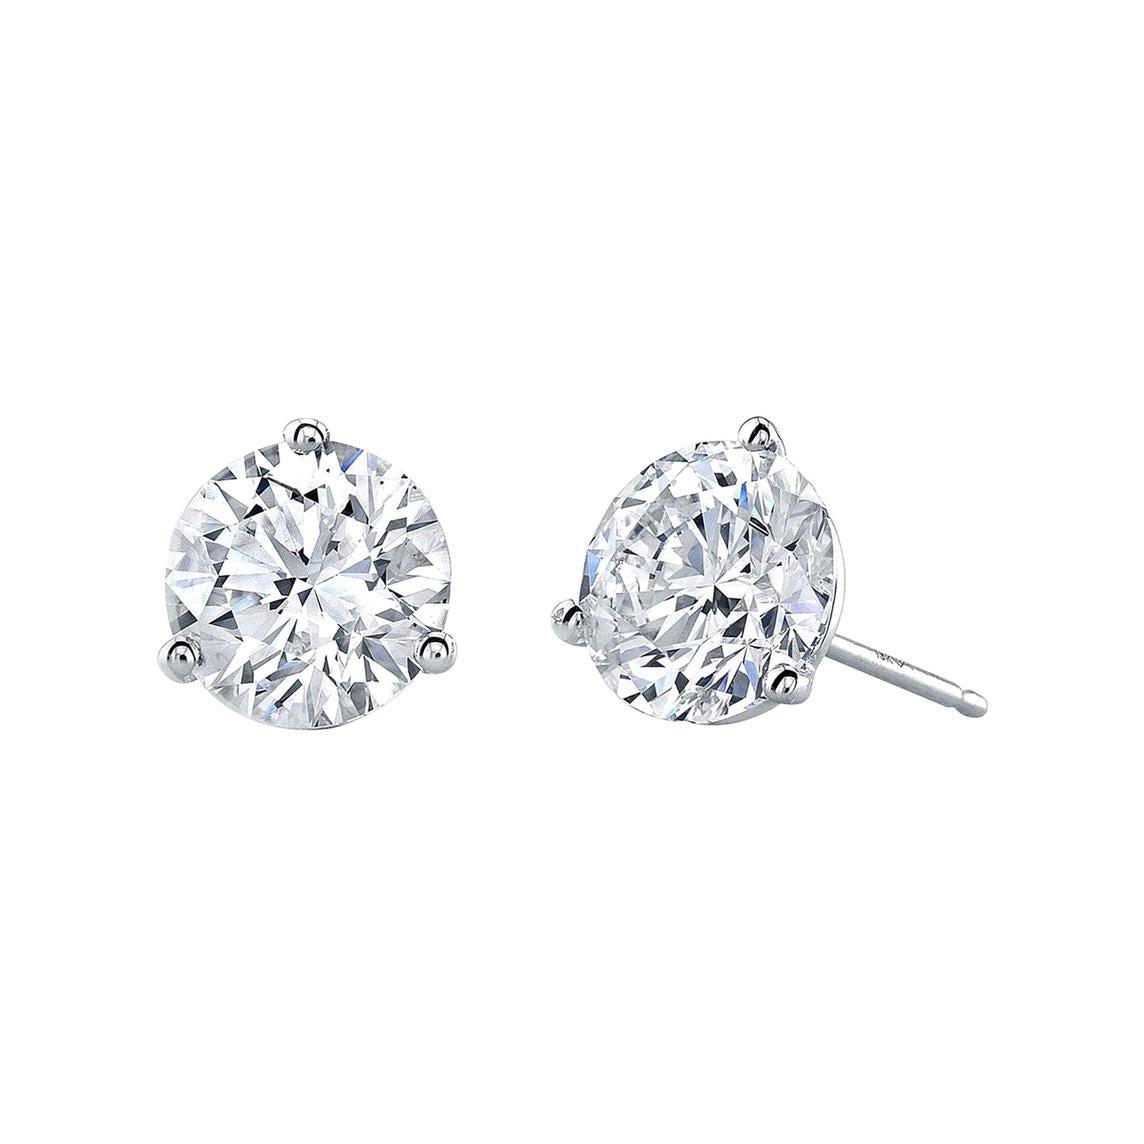 GIA Certified 10.04 Carat Diamond Stud Earrings